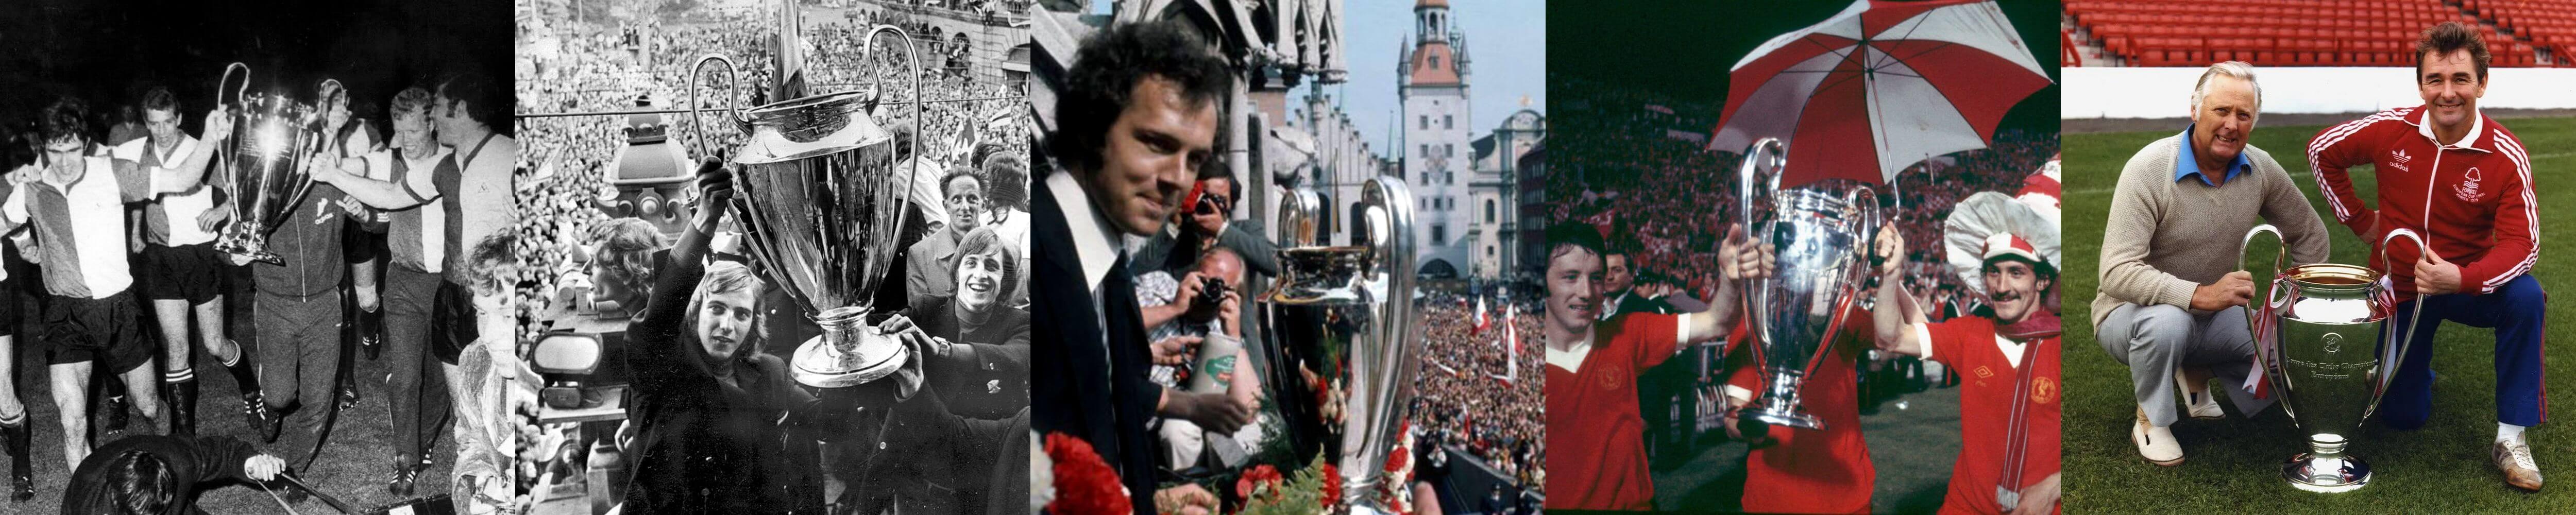 Champions League winners 1970s